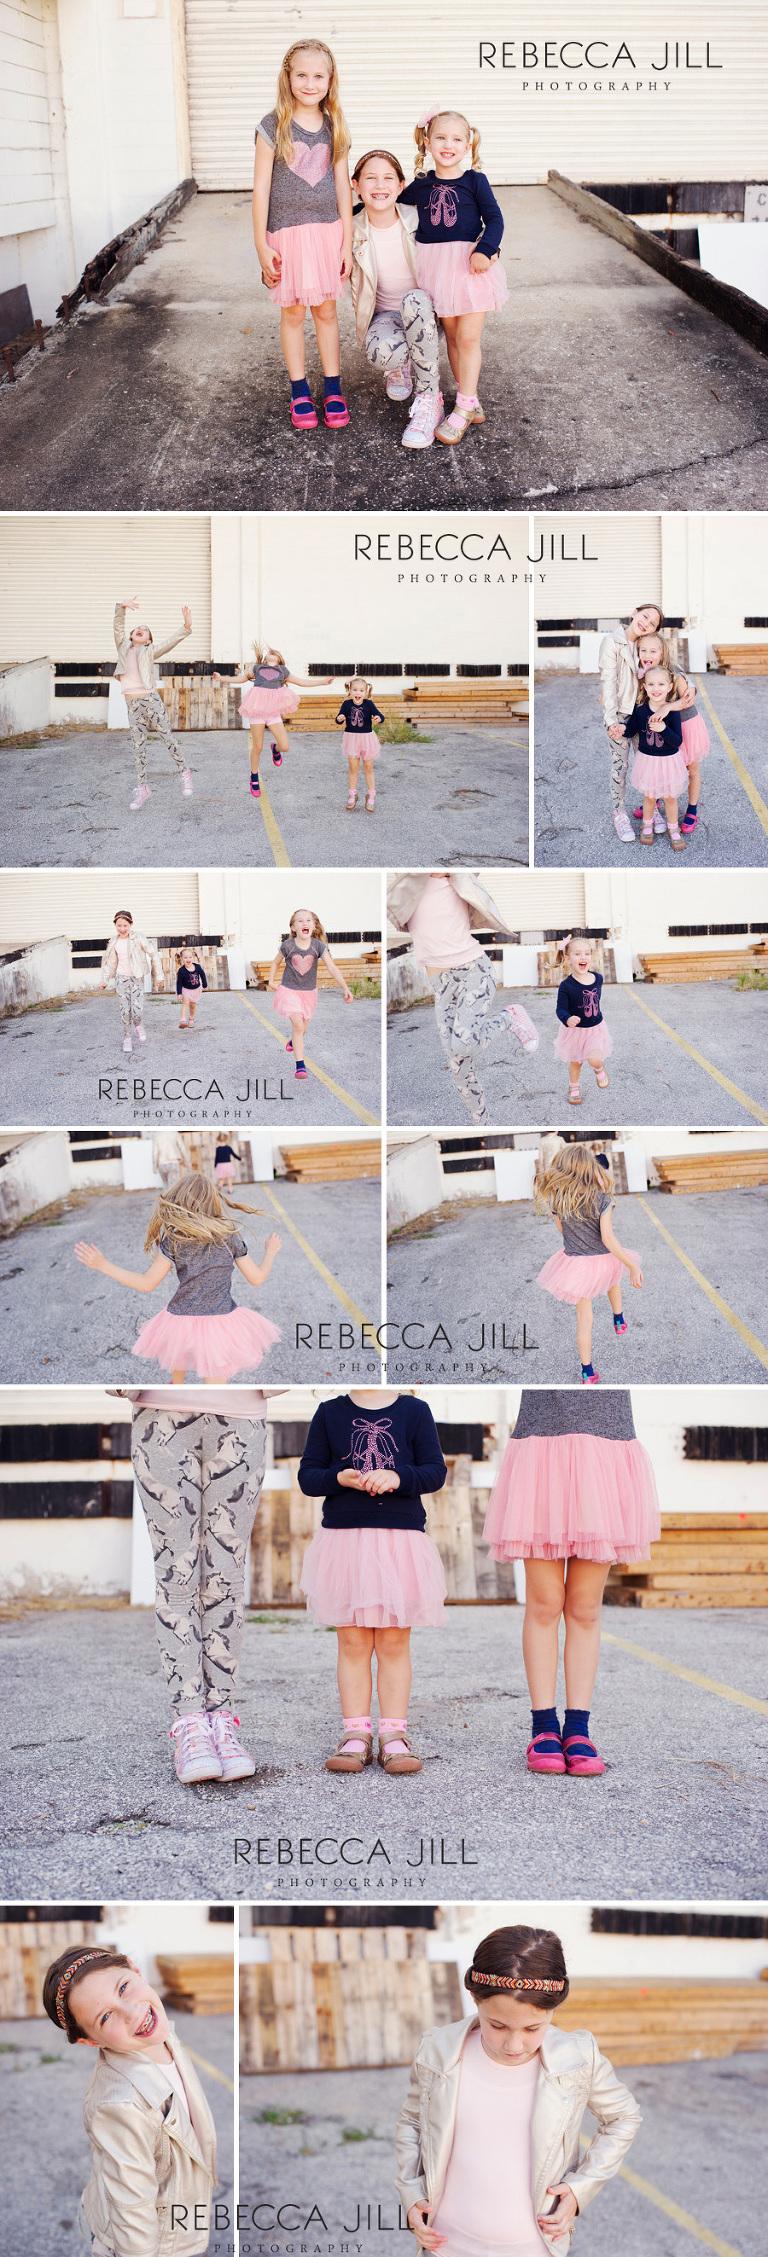 RebeccaJillPhotographyOrlandoFamilyPhotographer1 copy